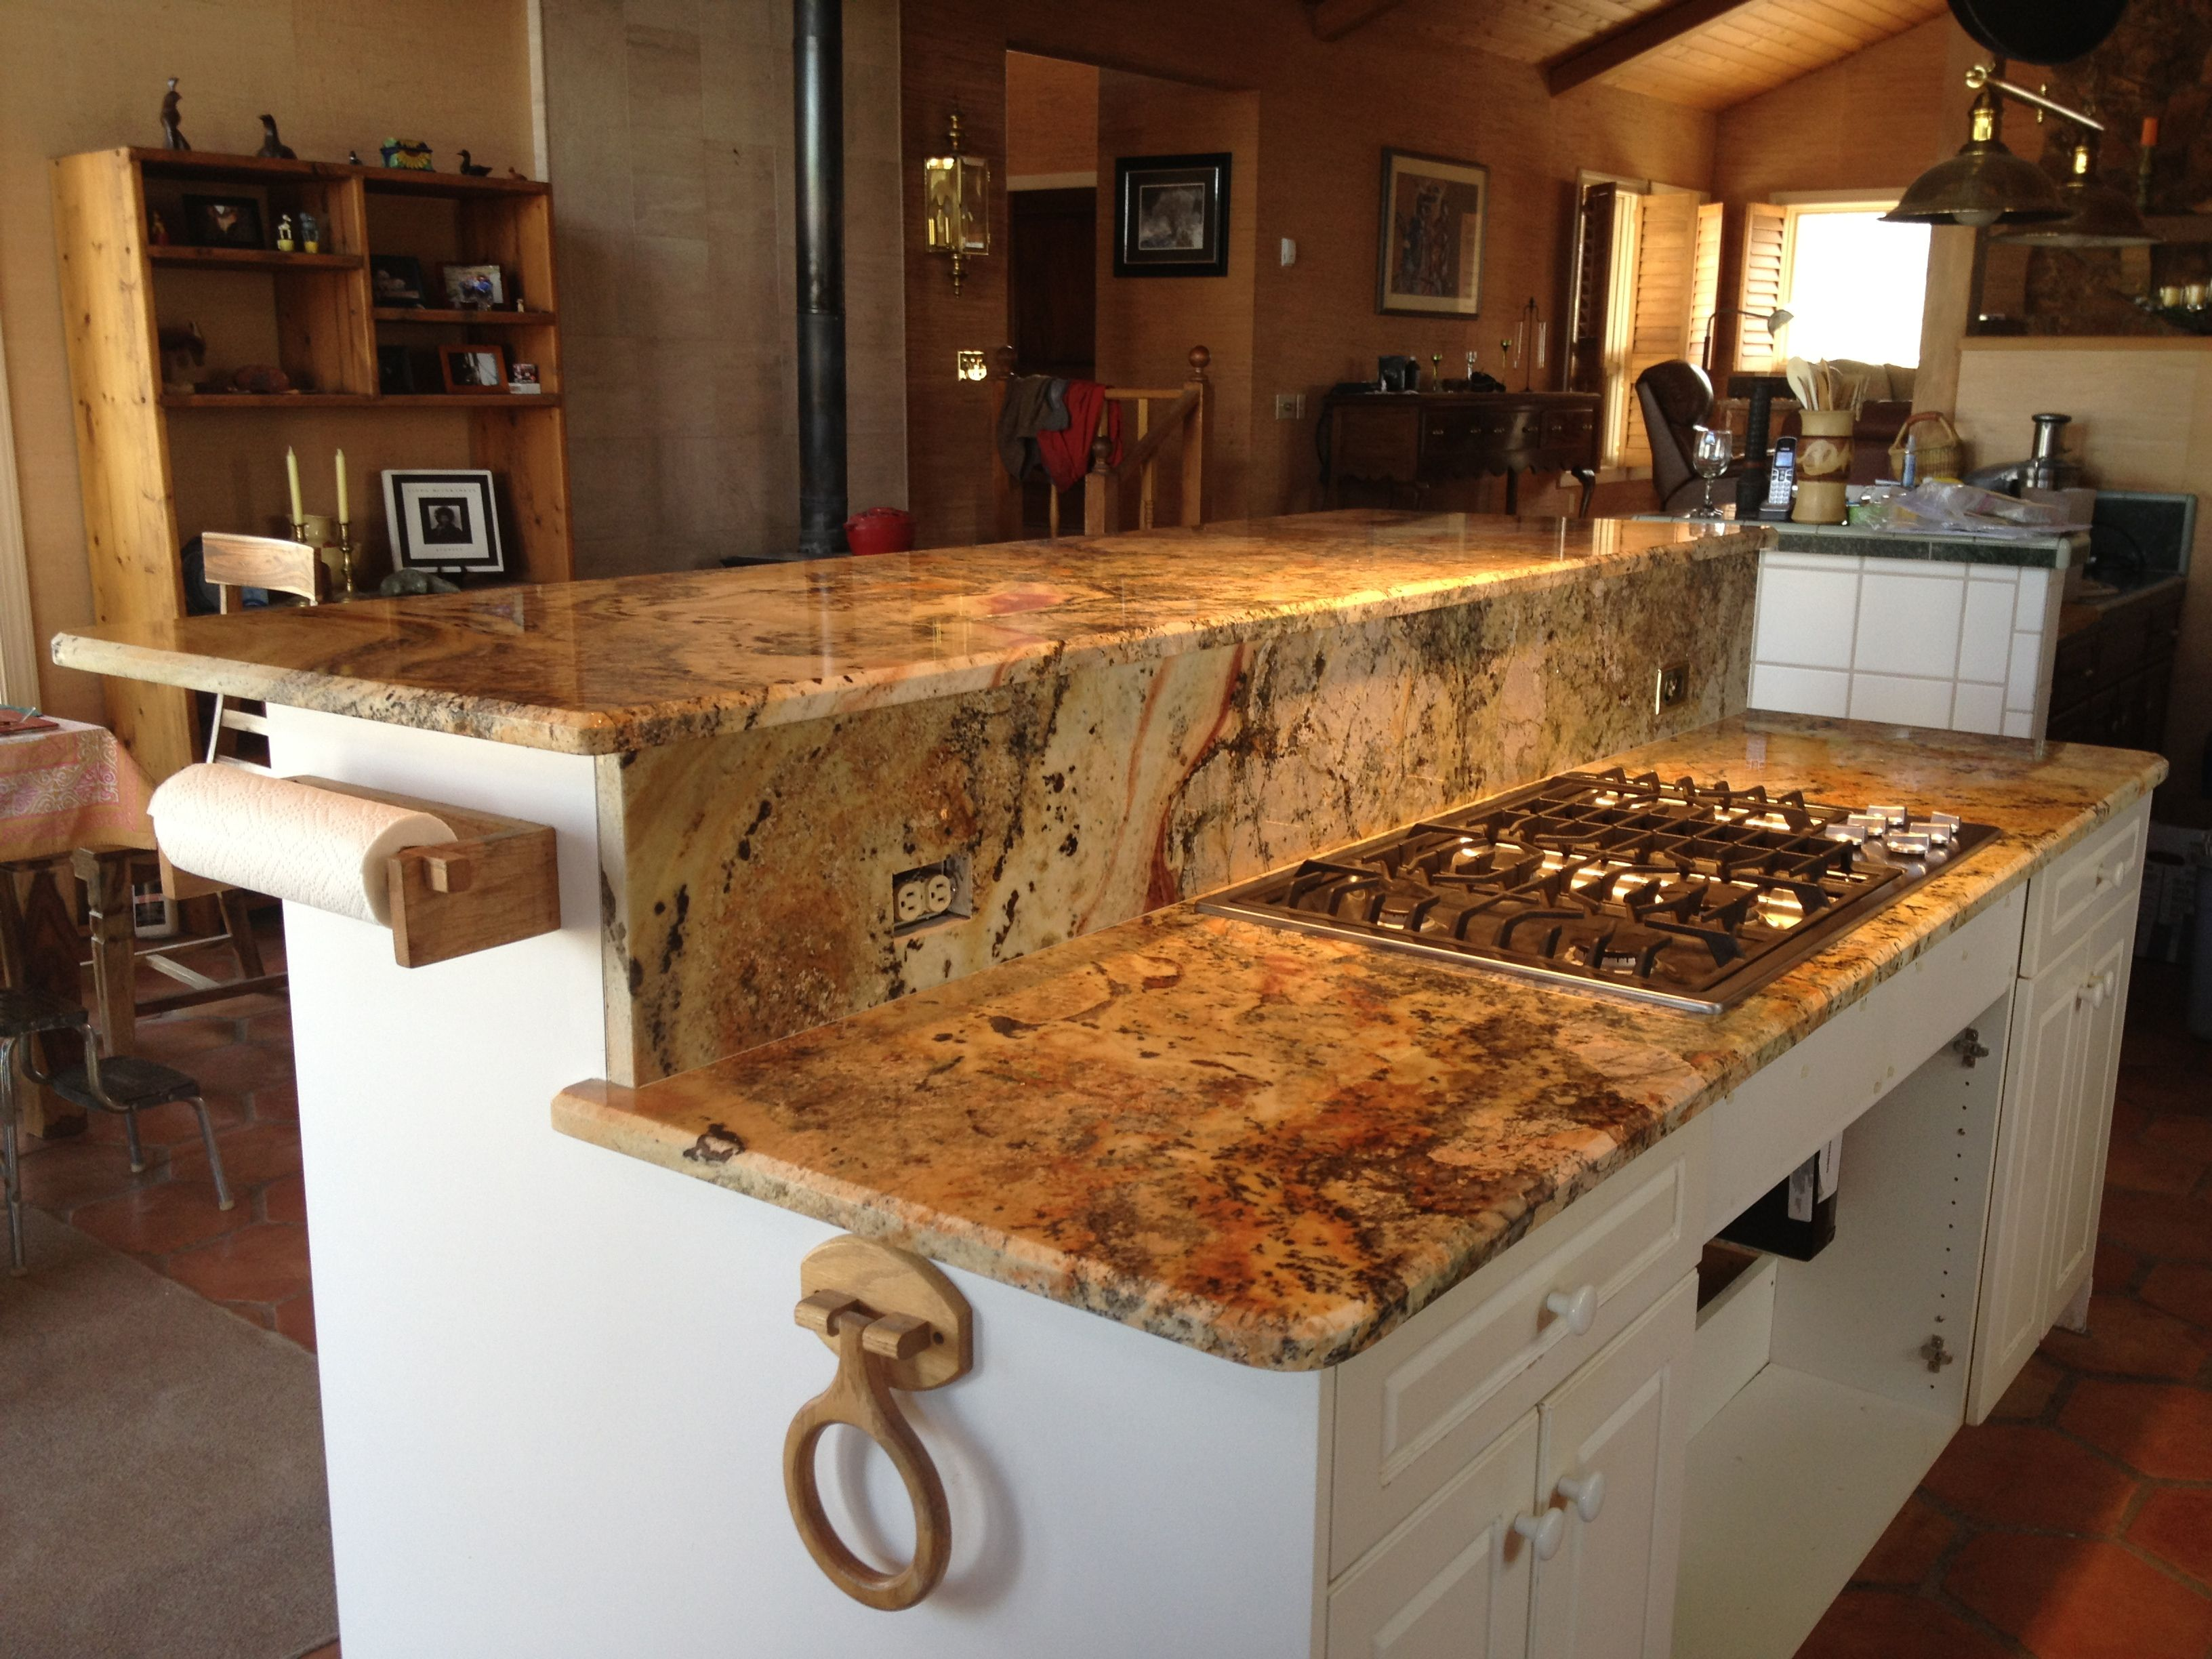 Baricatto Granite Granite Countertops Countertops Granite